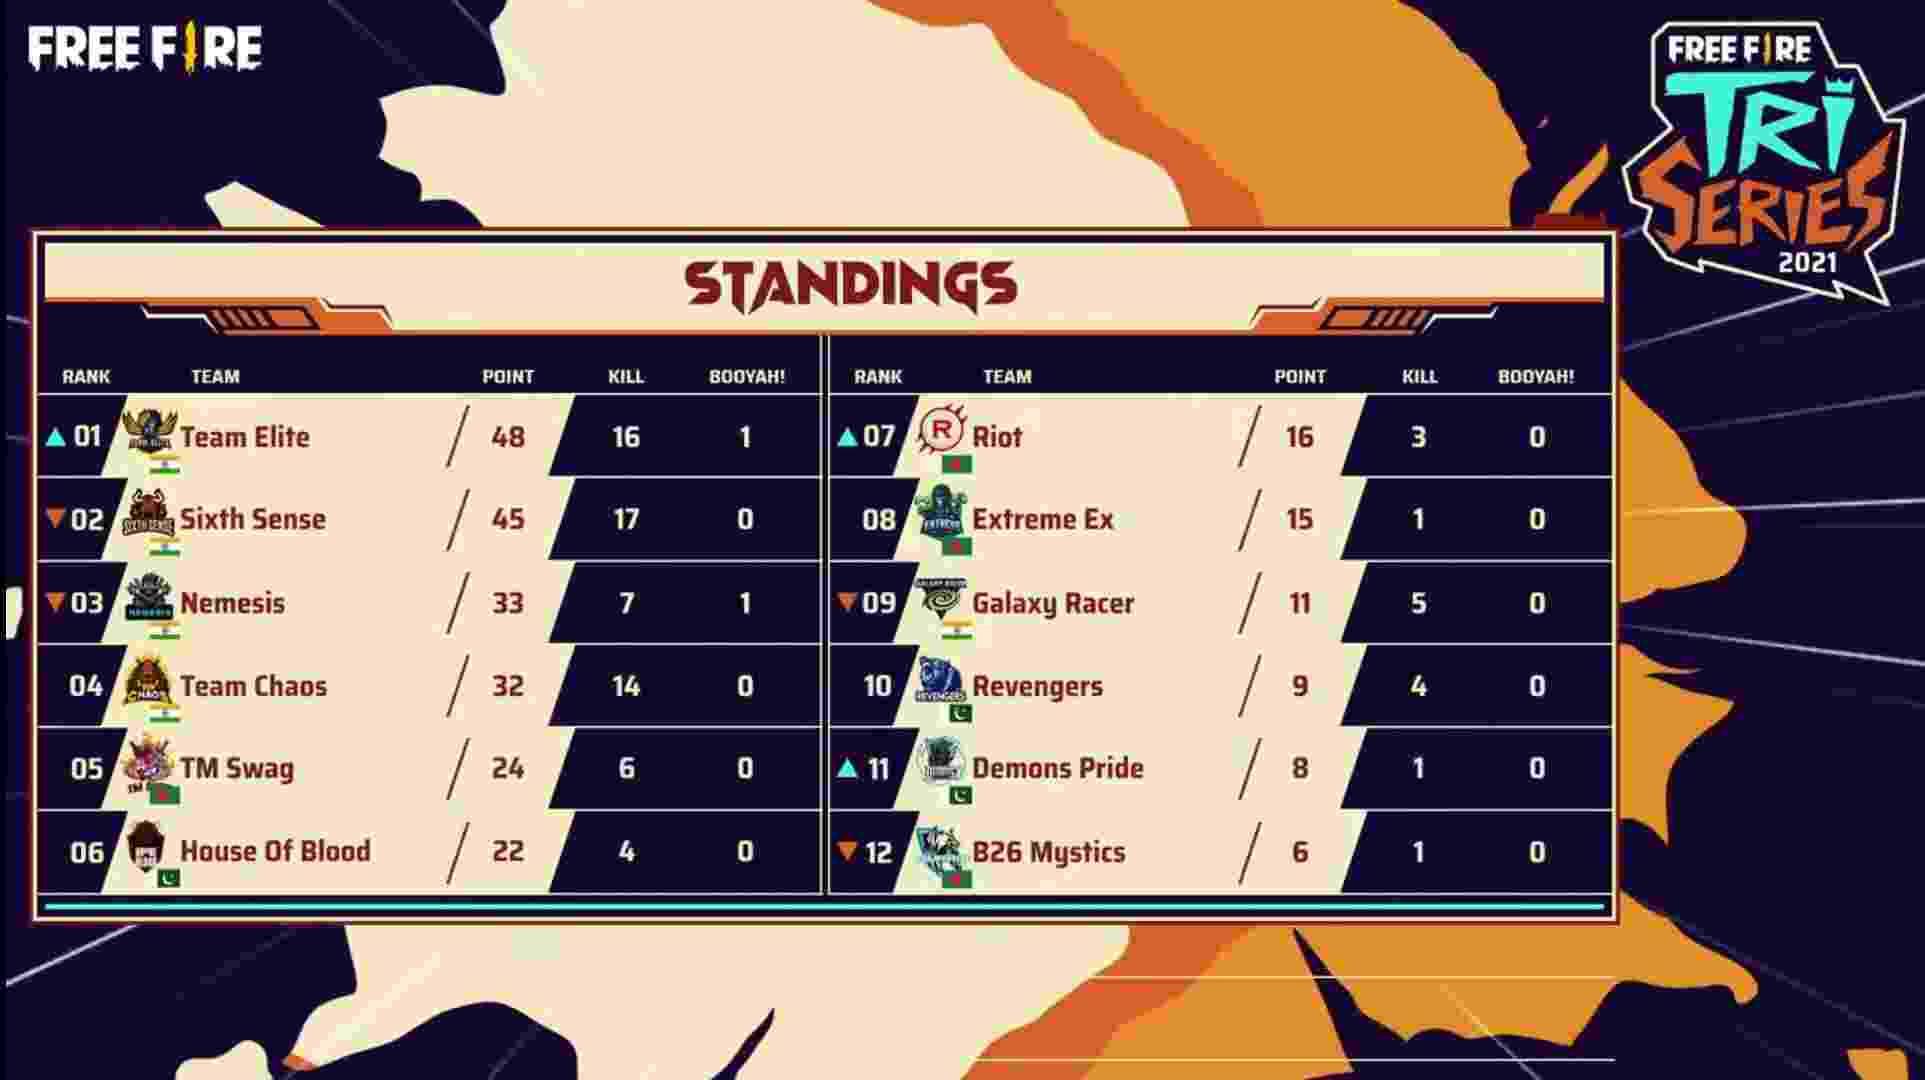 Free Fire Tri-Series Final Match 1 Standings